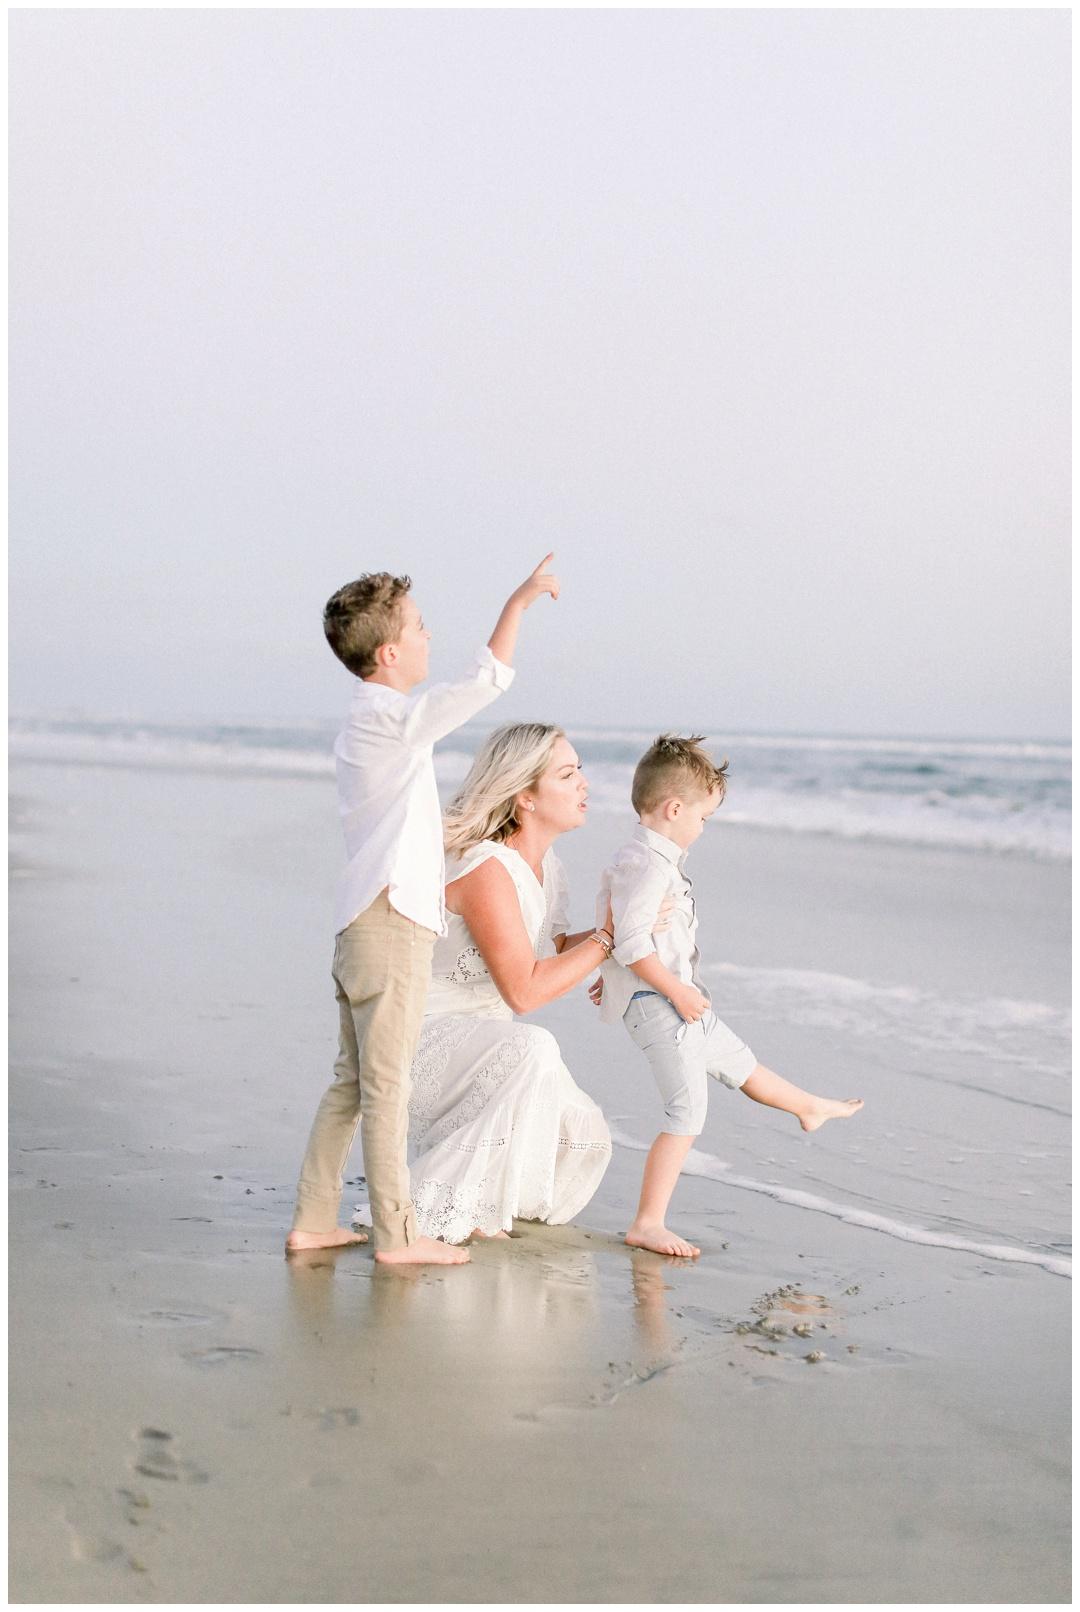 Newport_Beach_Family_Photographer_Newport_Beach_Newborn_Photographer_Orange_County_Family_Photographer_Cori_Kleckner_Photography_Huntington_Beach_San_Clemente_Family_Session_Photography__2356.jpg